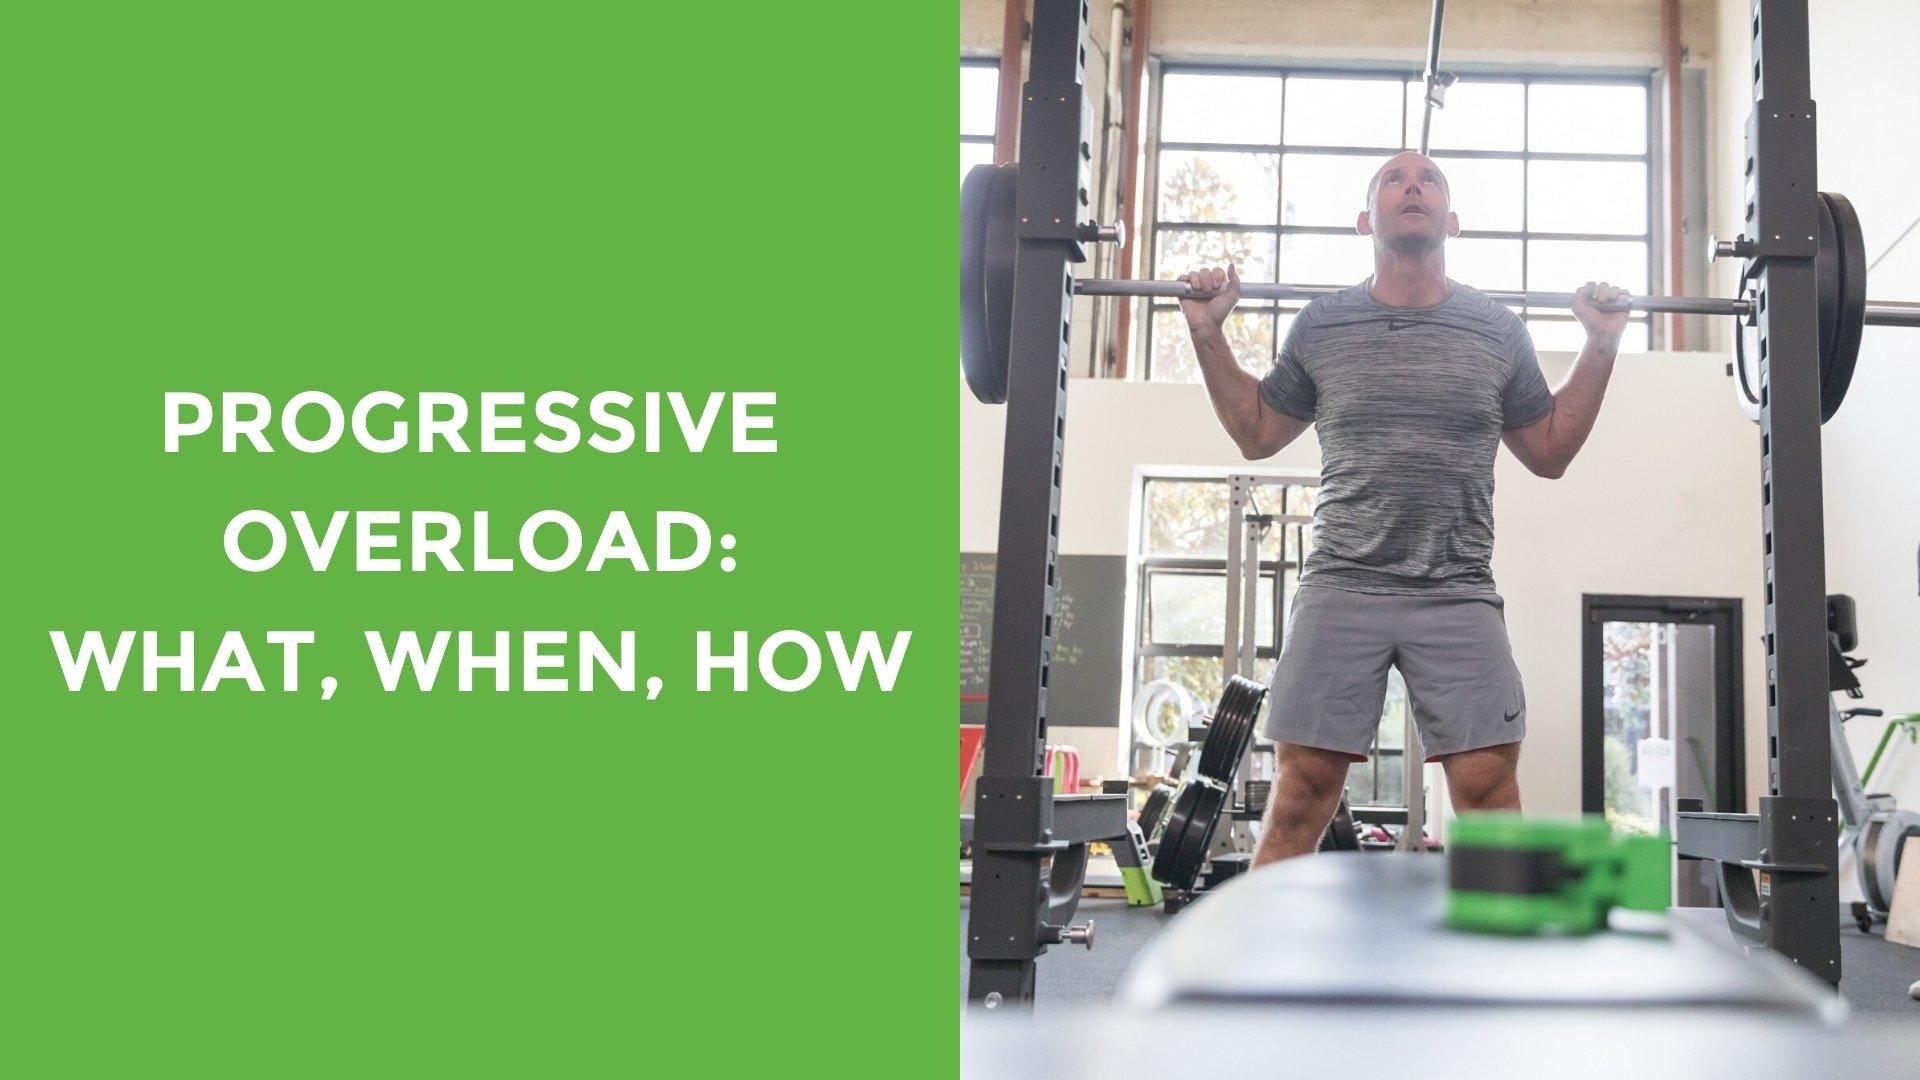 Progressive Overload: What, When, How